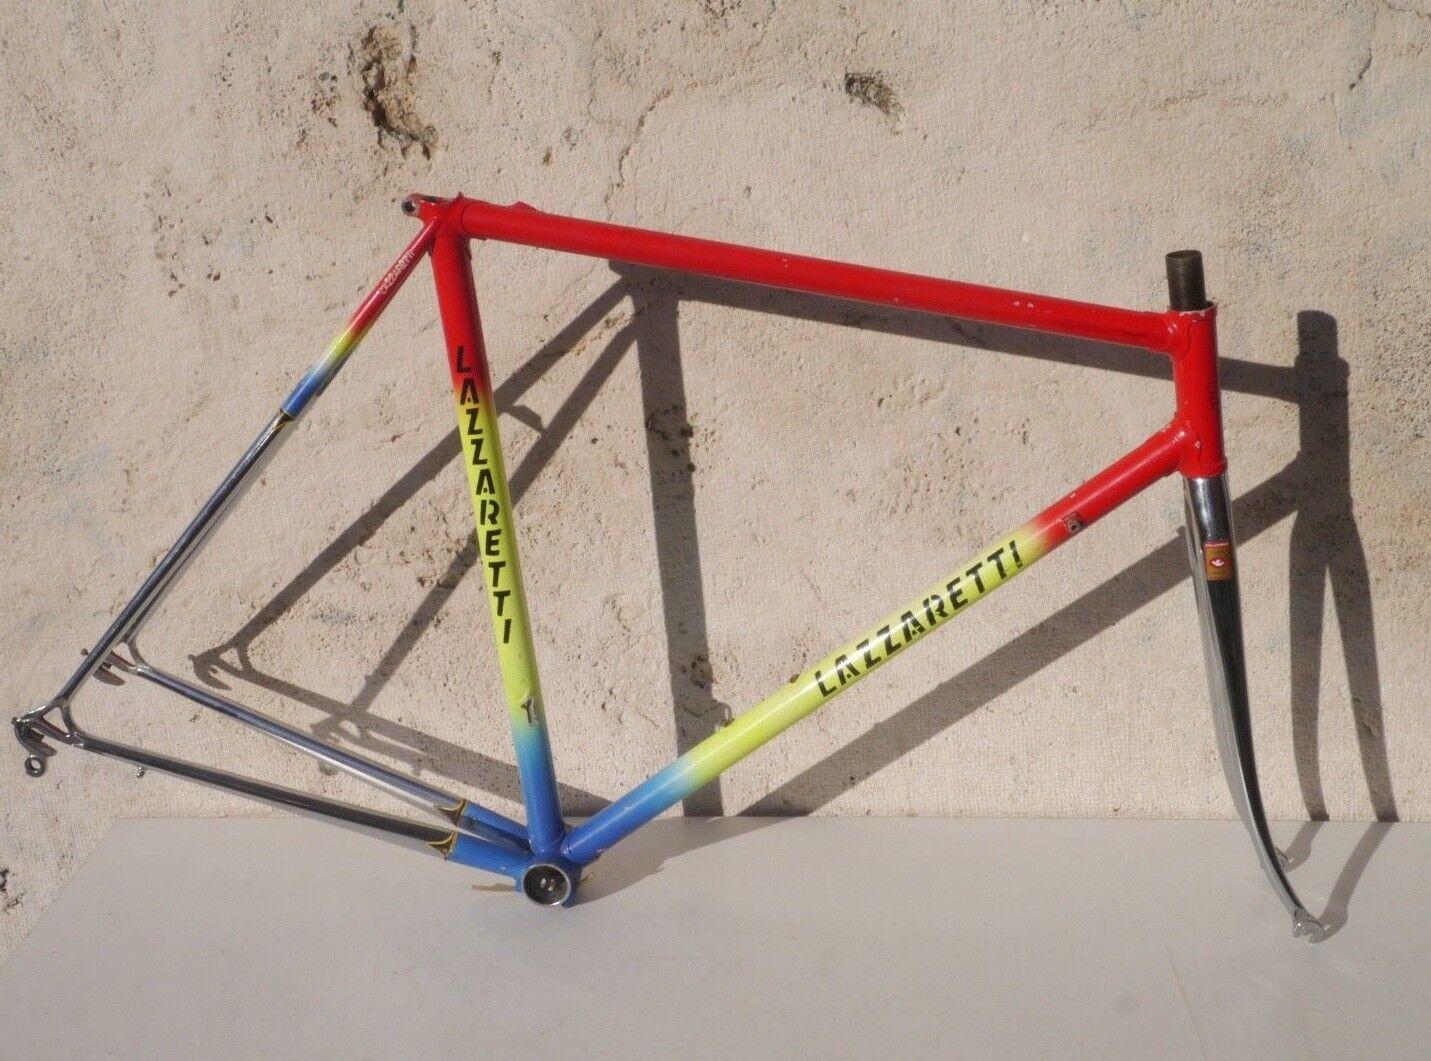 Lazzaretti road bike steel frame-set, Columbus Slx, 53 cm, Cinelli BB Campagnolo